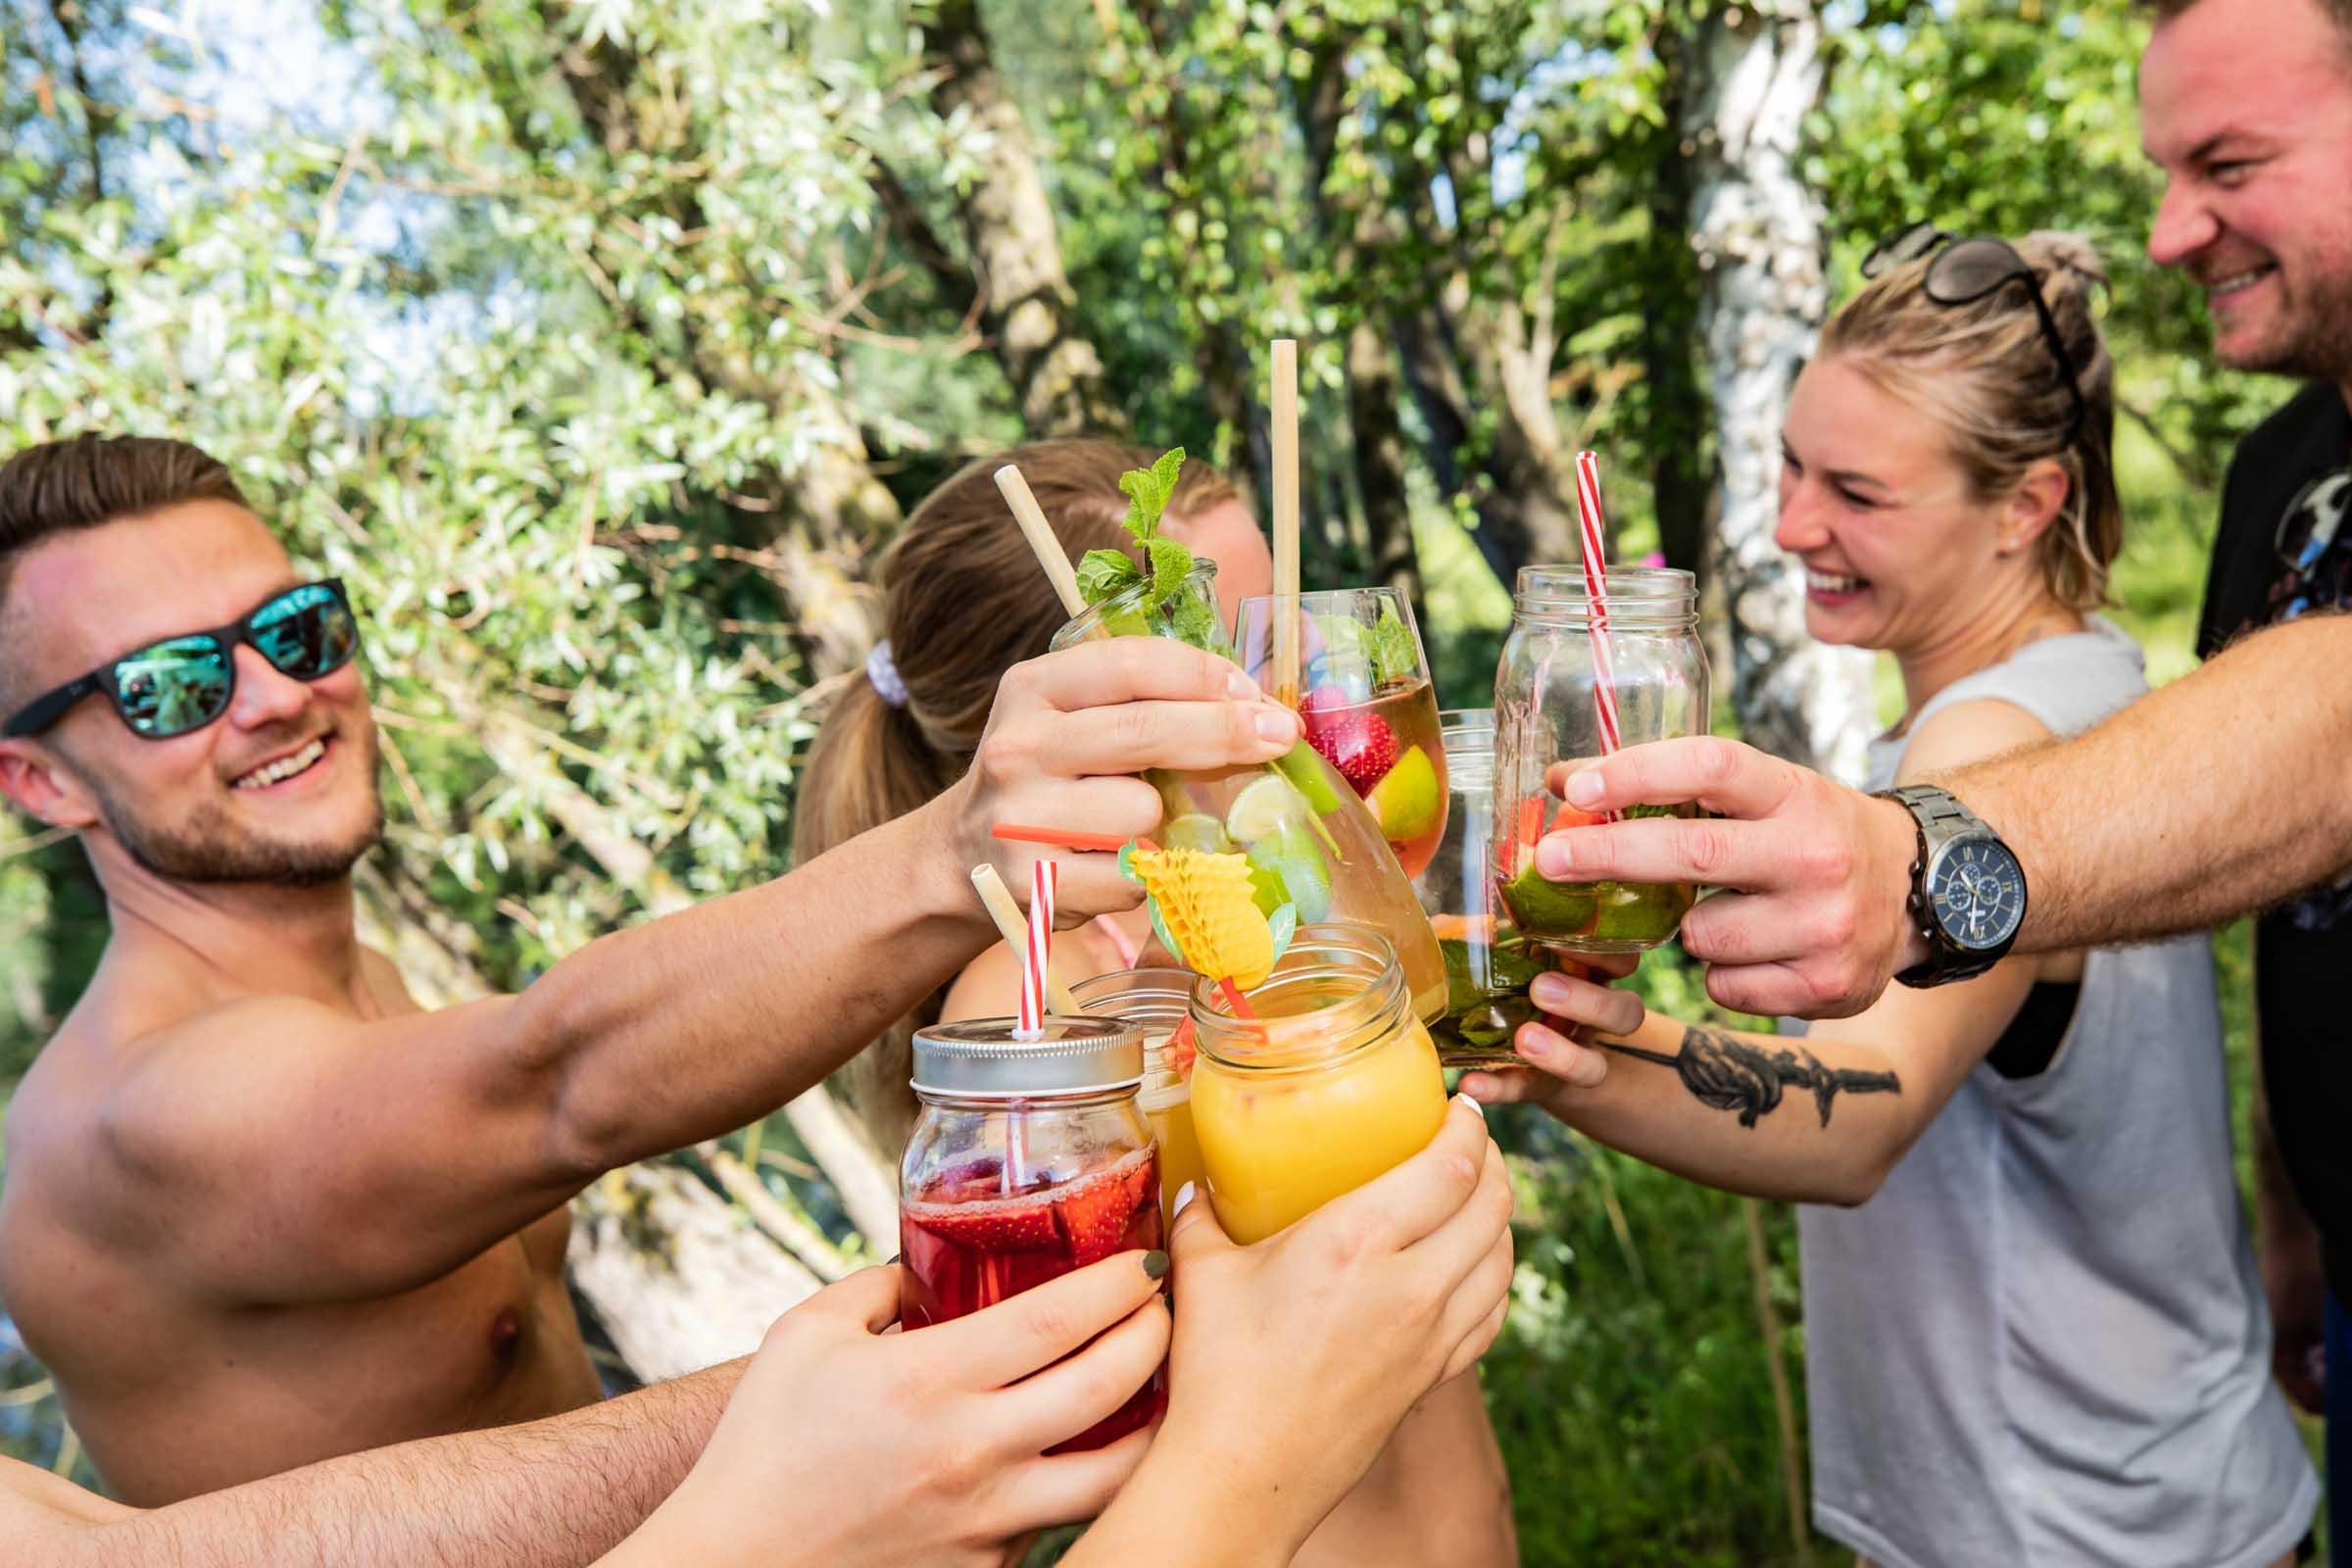 Barformat | Mobile | Bar | Cocktailservice | Hannover | Getränke | Catering | Cocktails | Wein | Aperitif | Kaffee | Gin | Hochzeit | Messe | Firmenfeier | Buchen | Mieten | Anfragen